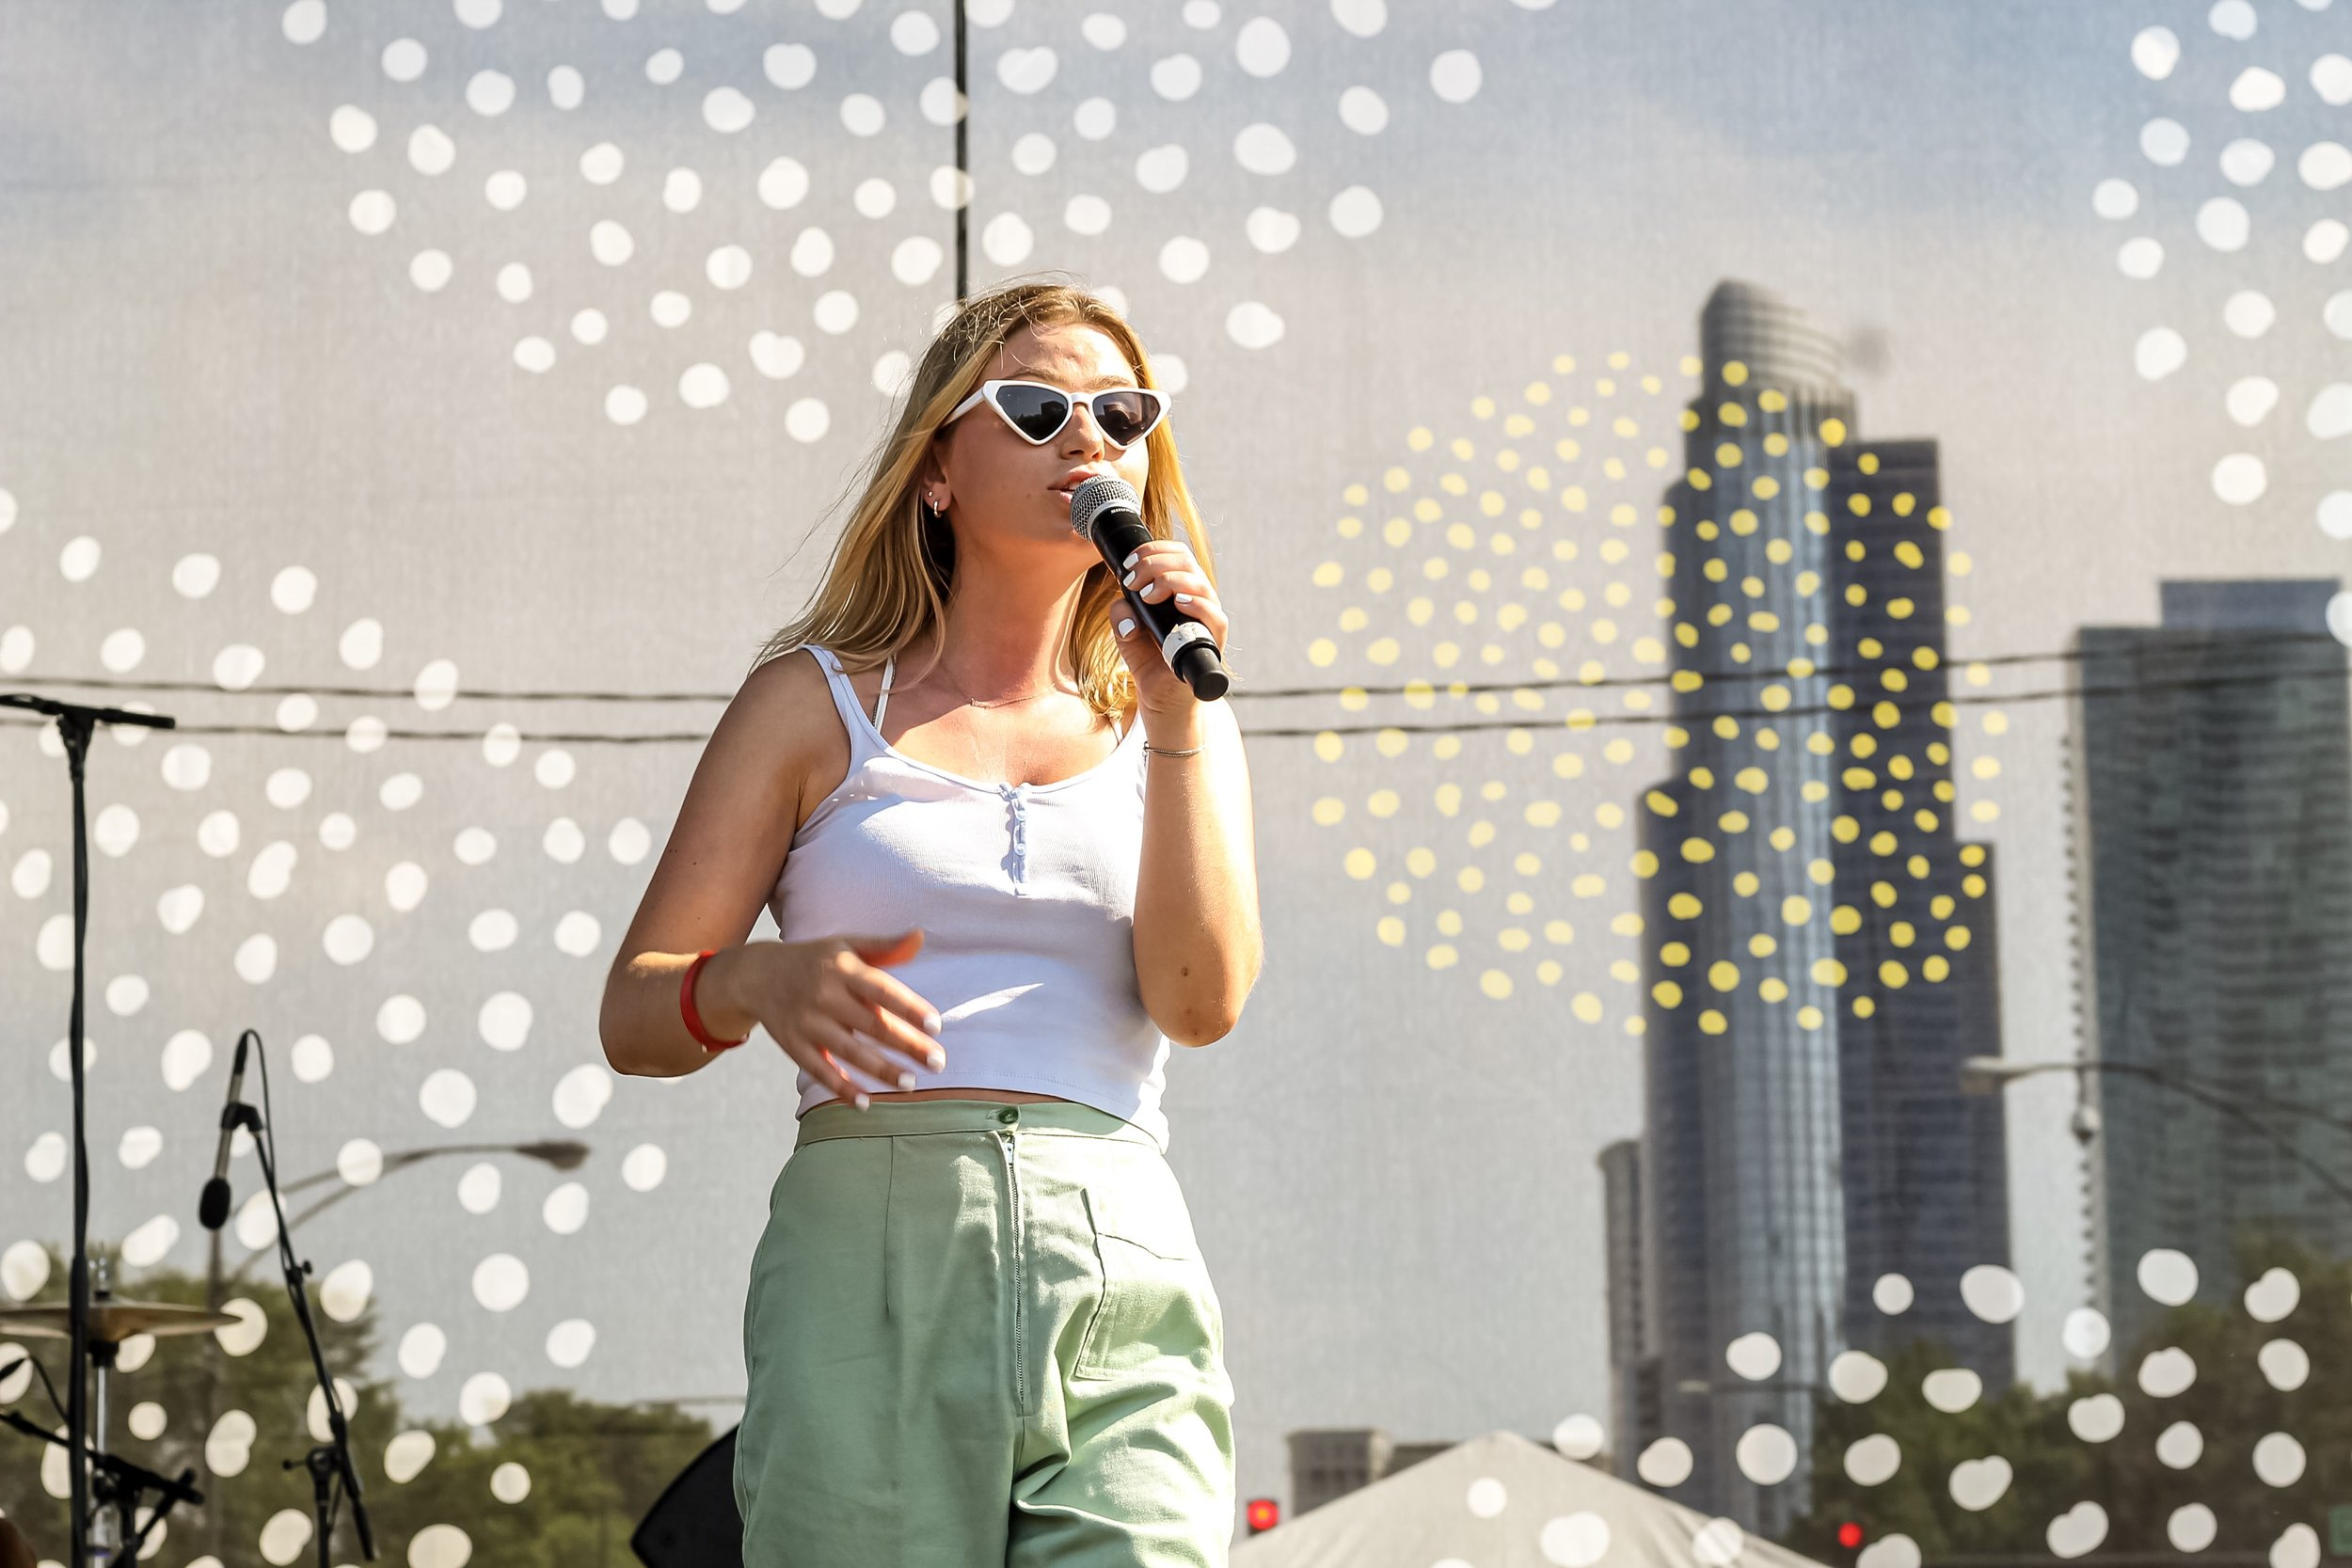 OSTON     // 2019-07-14 //   Taste Of Chicago   -   Grant Park   - Goose Island Stage - Chicago, IL // Photos by  Cristian Castillo